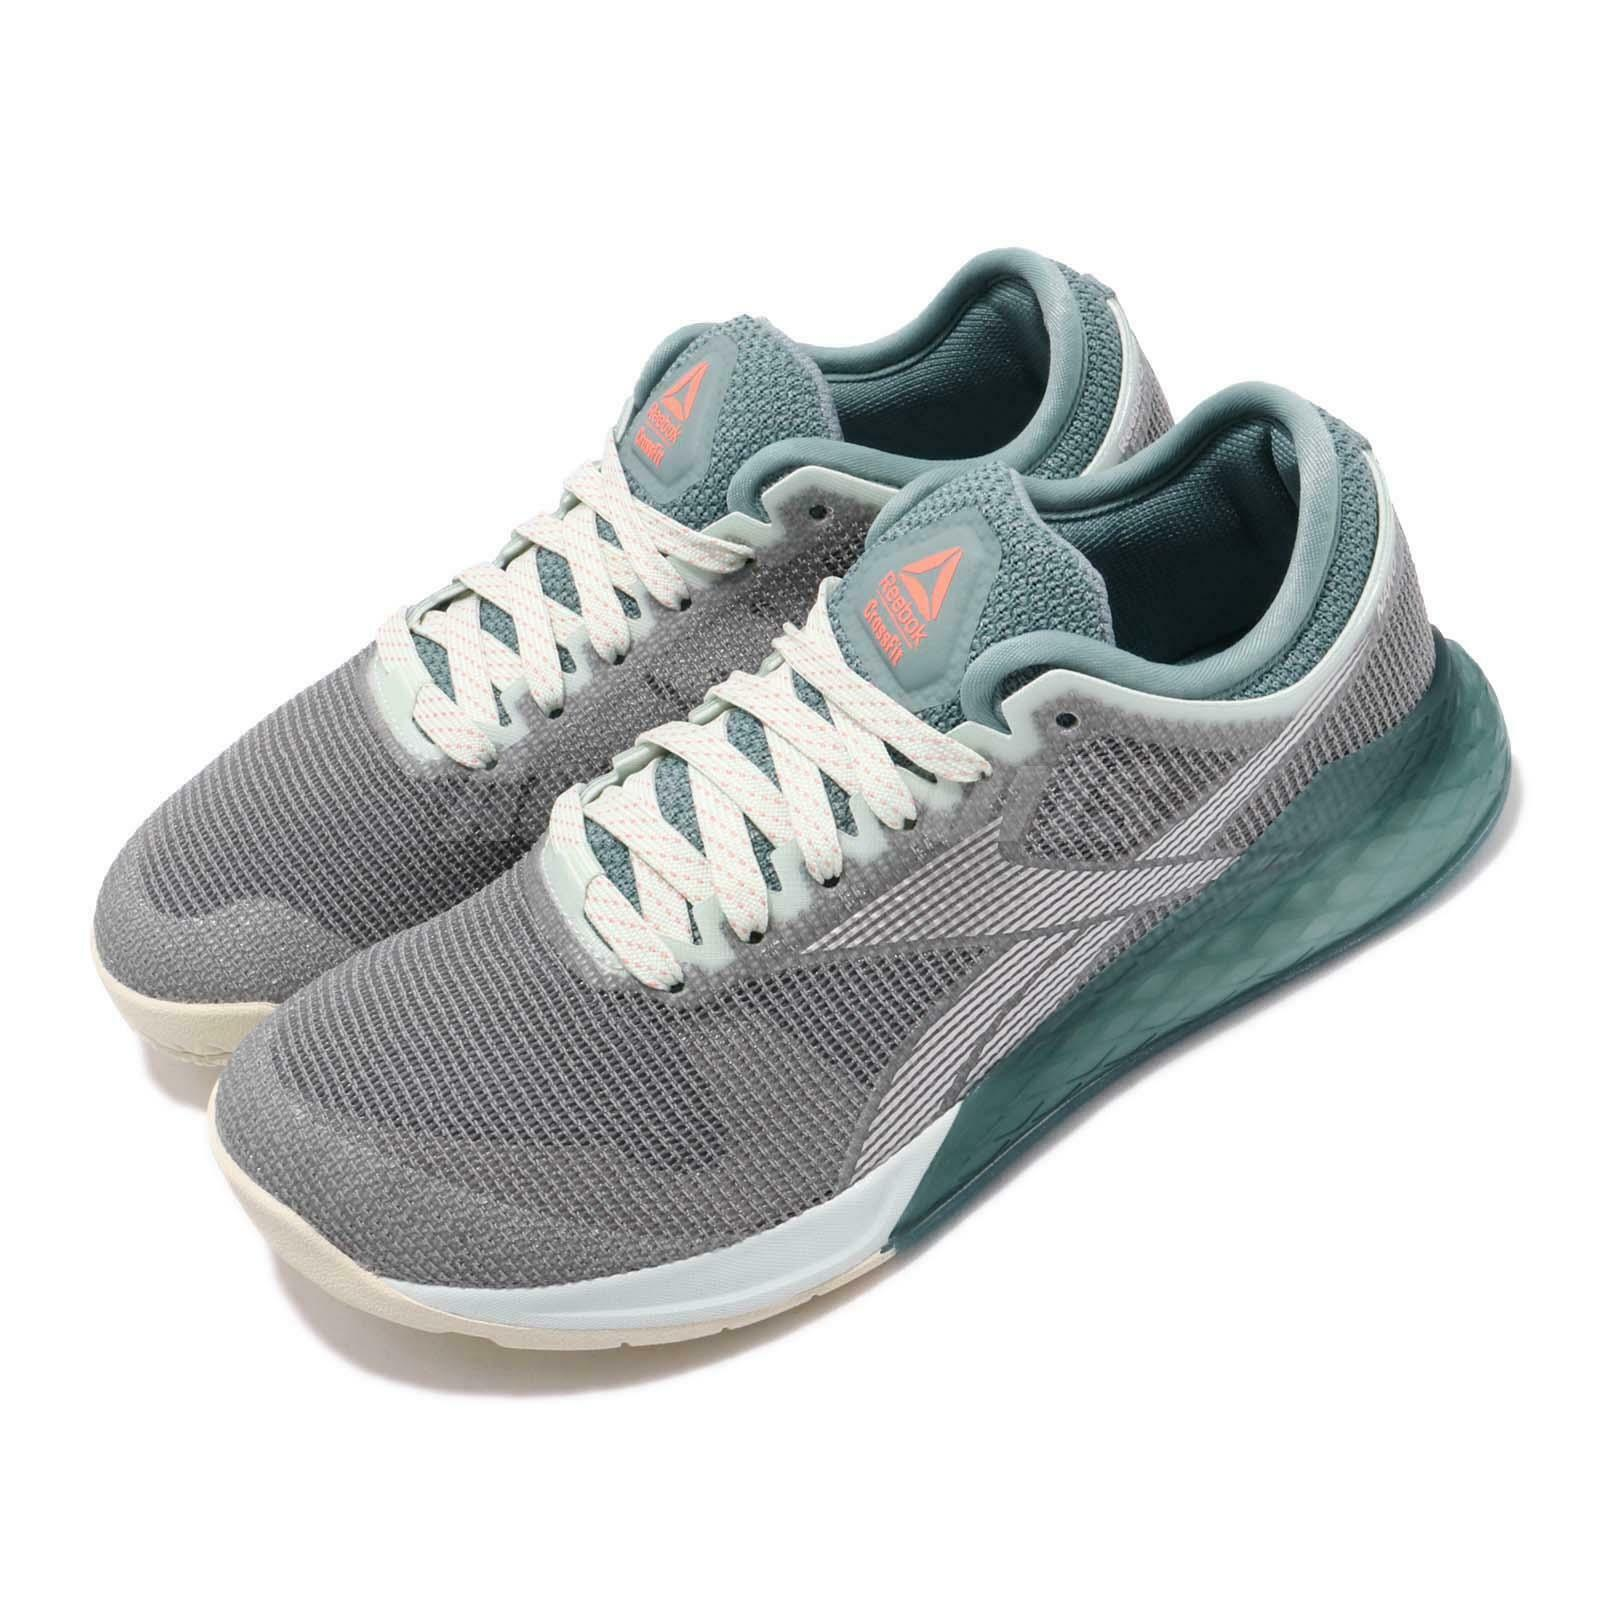 Reebok Nano 9 grigio verde bianca donna CrossFit Cross Training scarpe scarpe da ginnastica FU6831